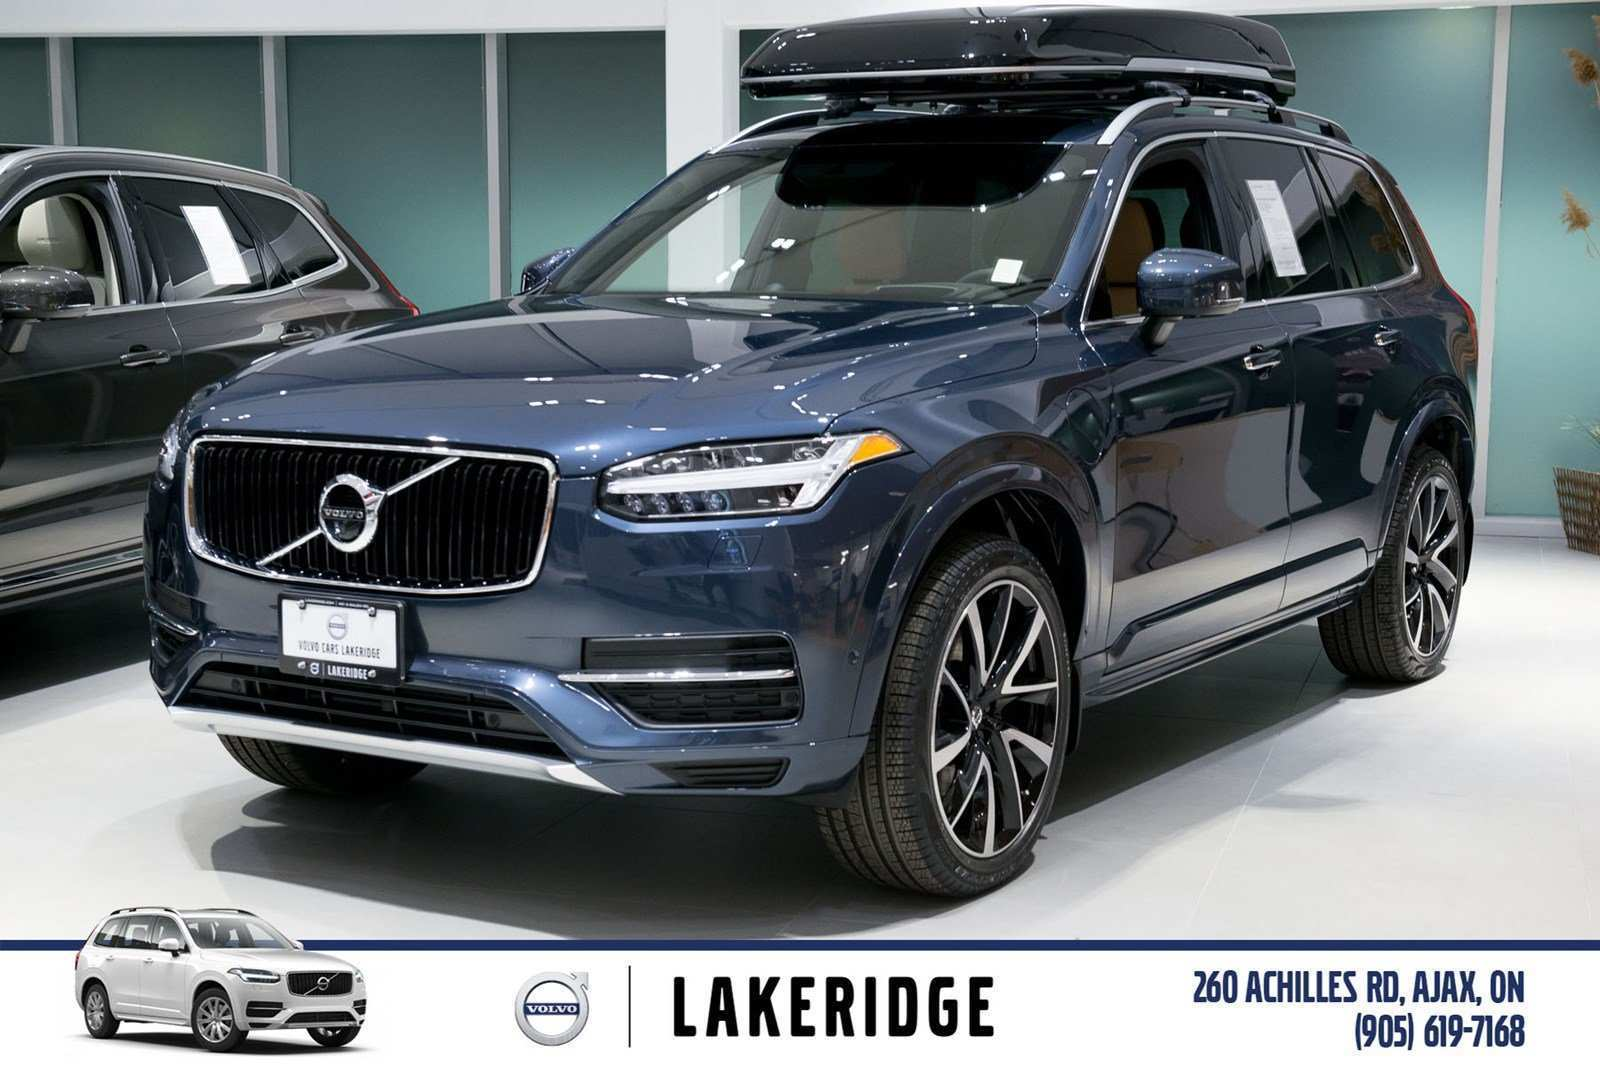 75 All New Volvo Cx90 2019 Model with Volvo Cx90 2019